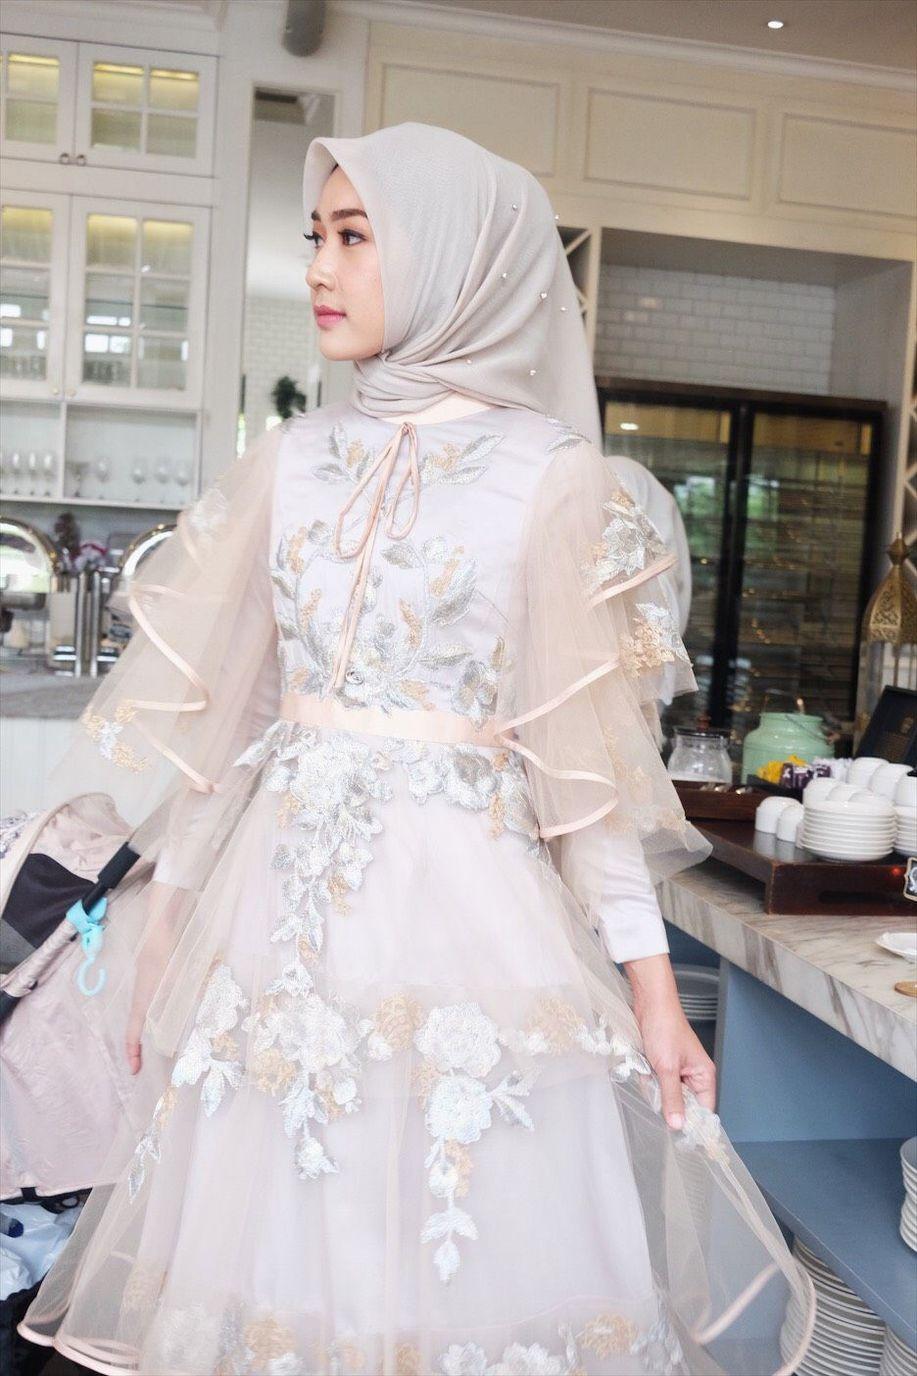 Tren Busana Pengantin Hijab Terbaru Menurut Desainer Ayu Dyah Andari https://t.co/WstkAMAKUX via @wolipop https://t.co/BLr5eBvLie